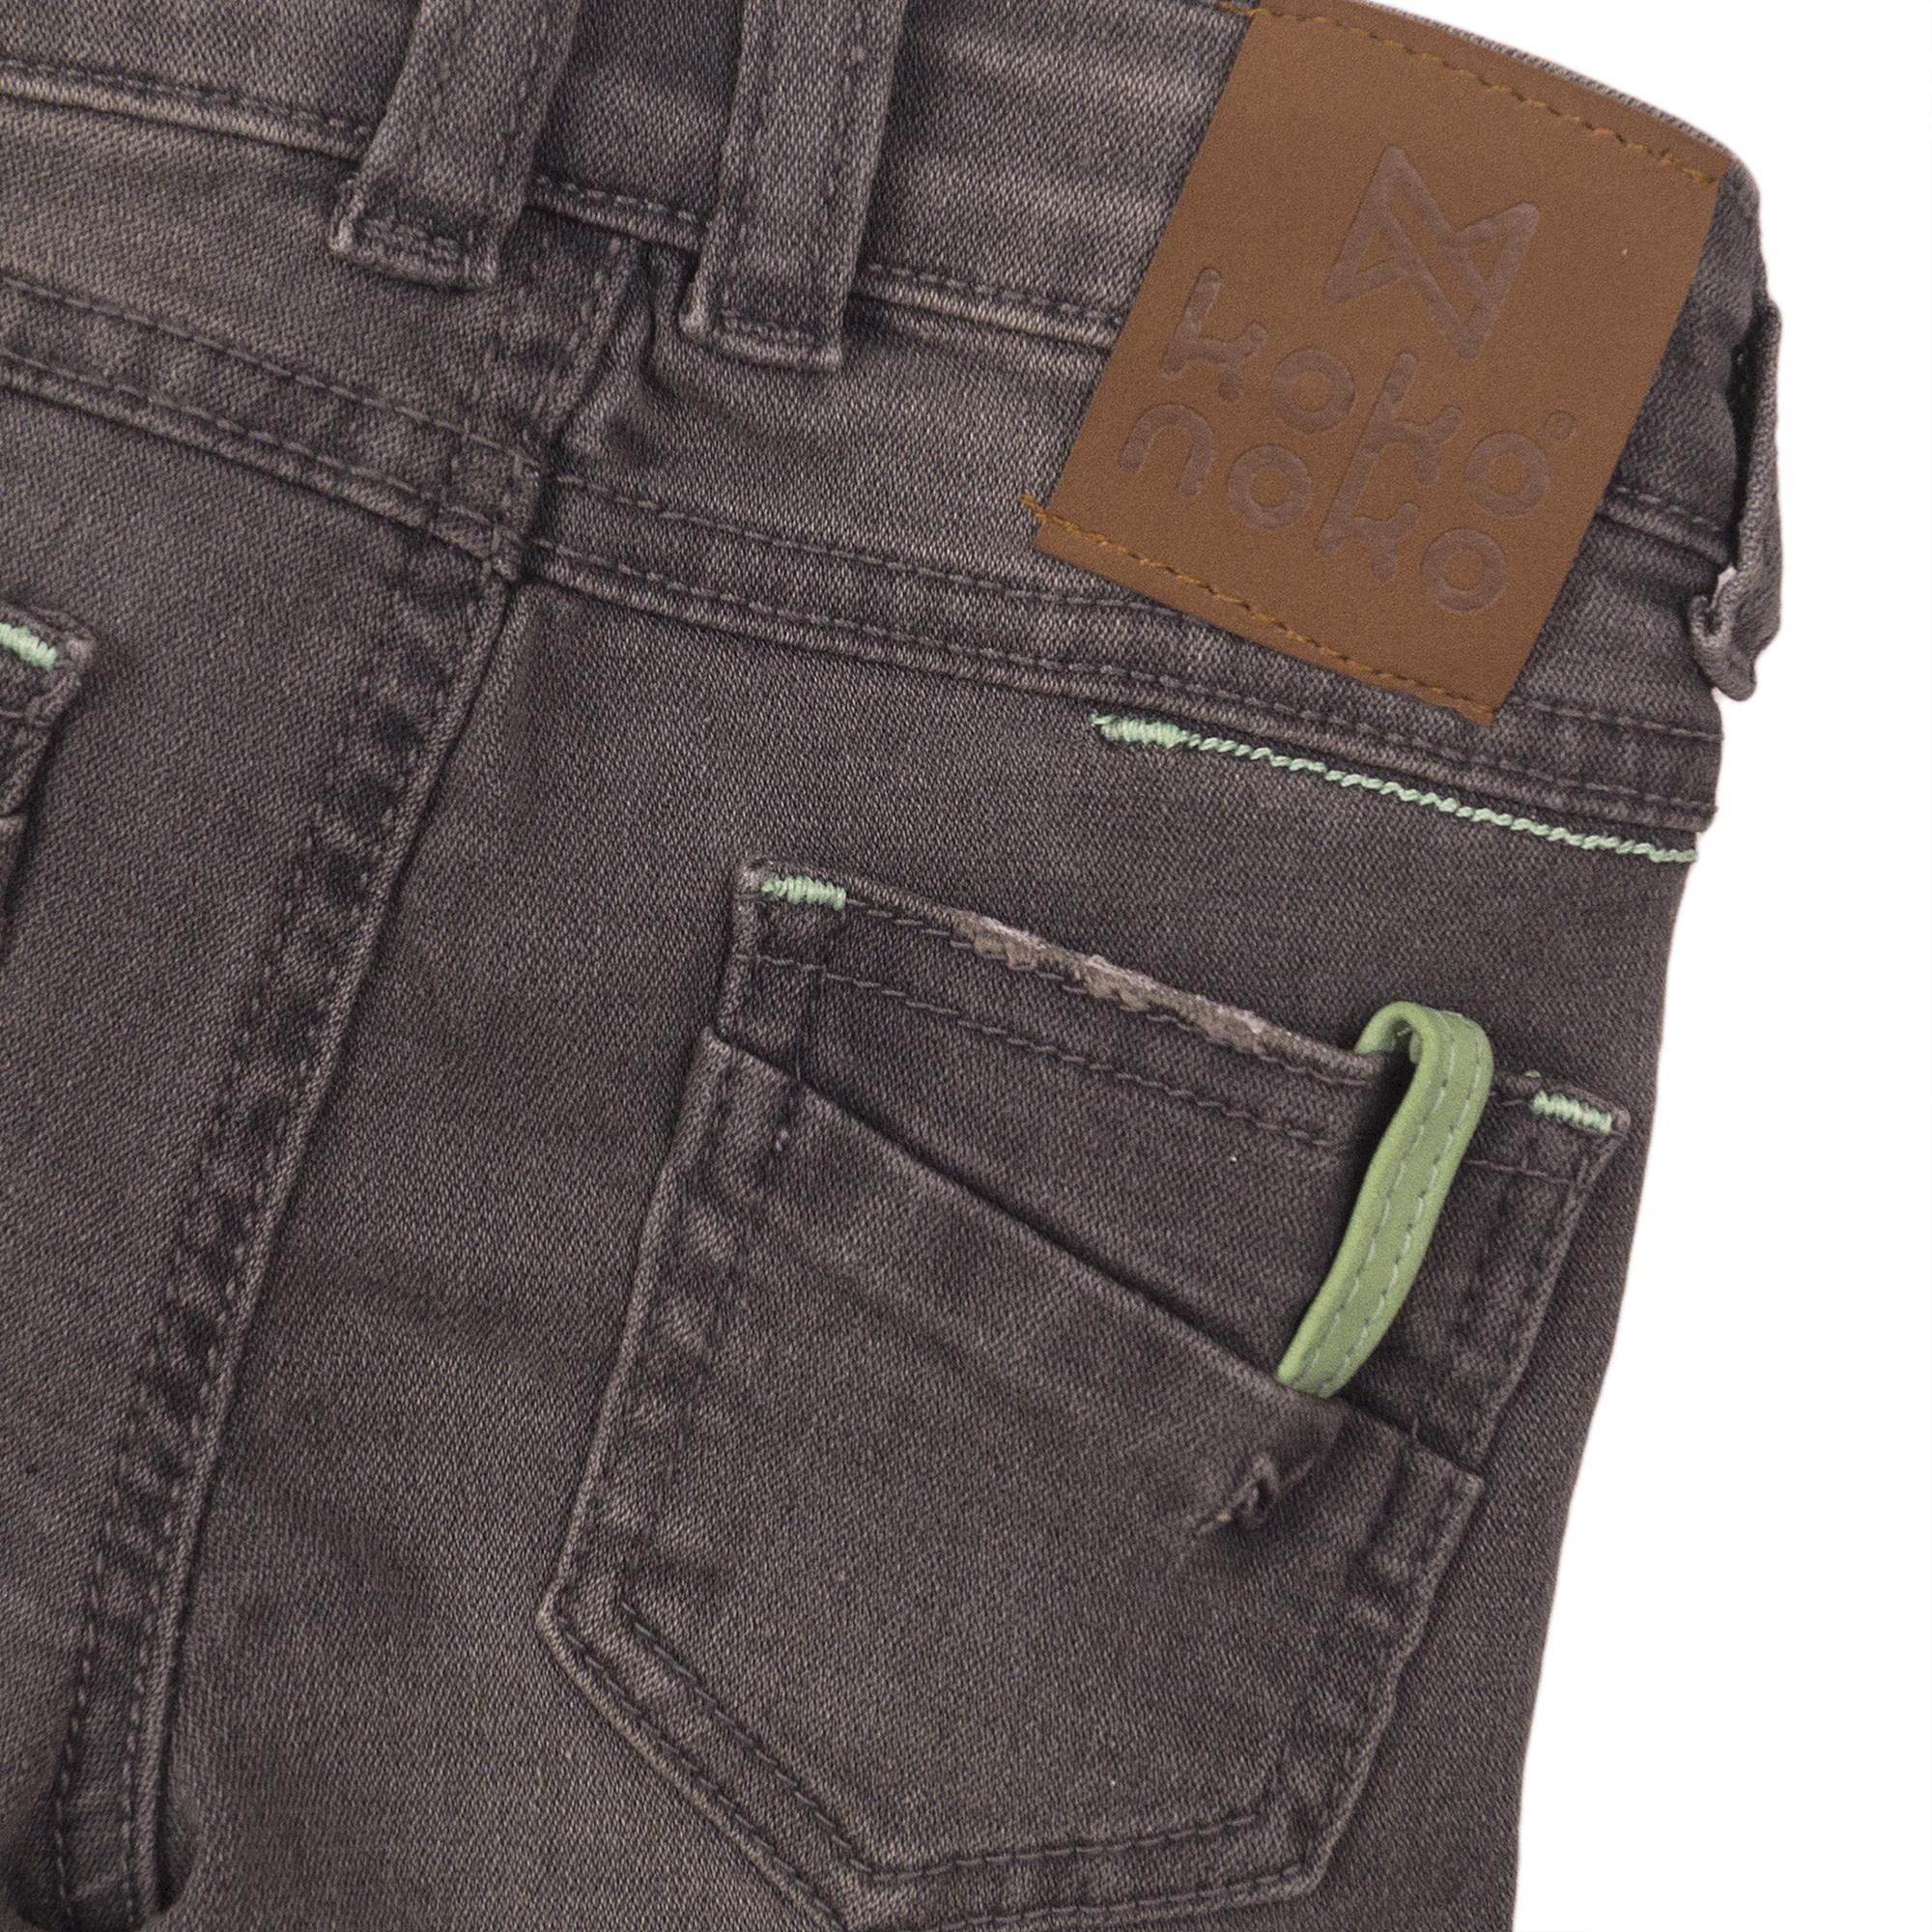 Green Accent Denim Shorts